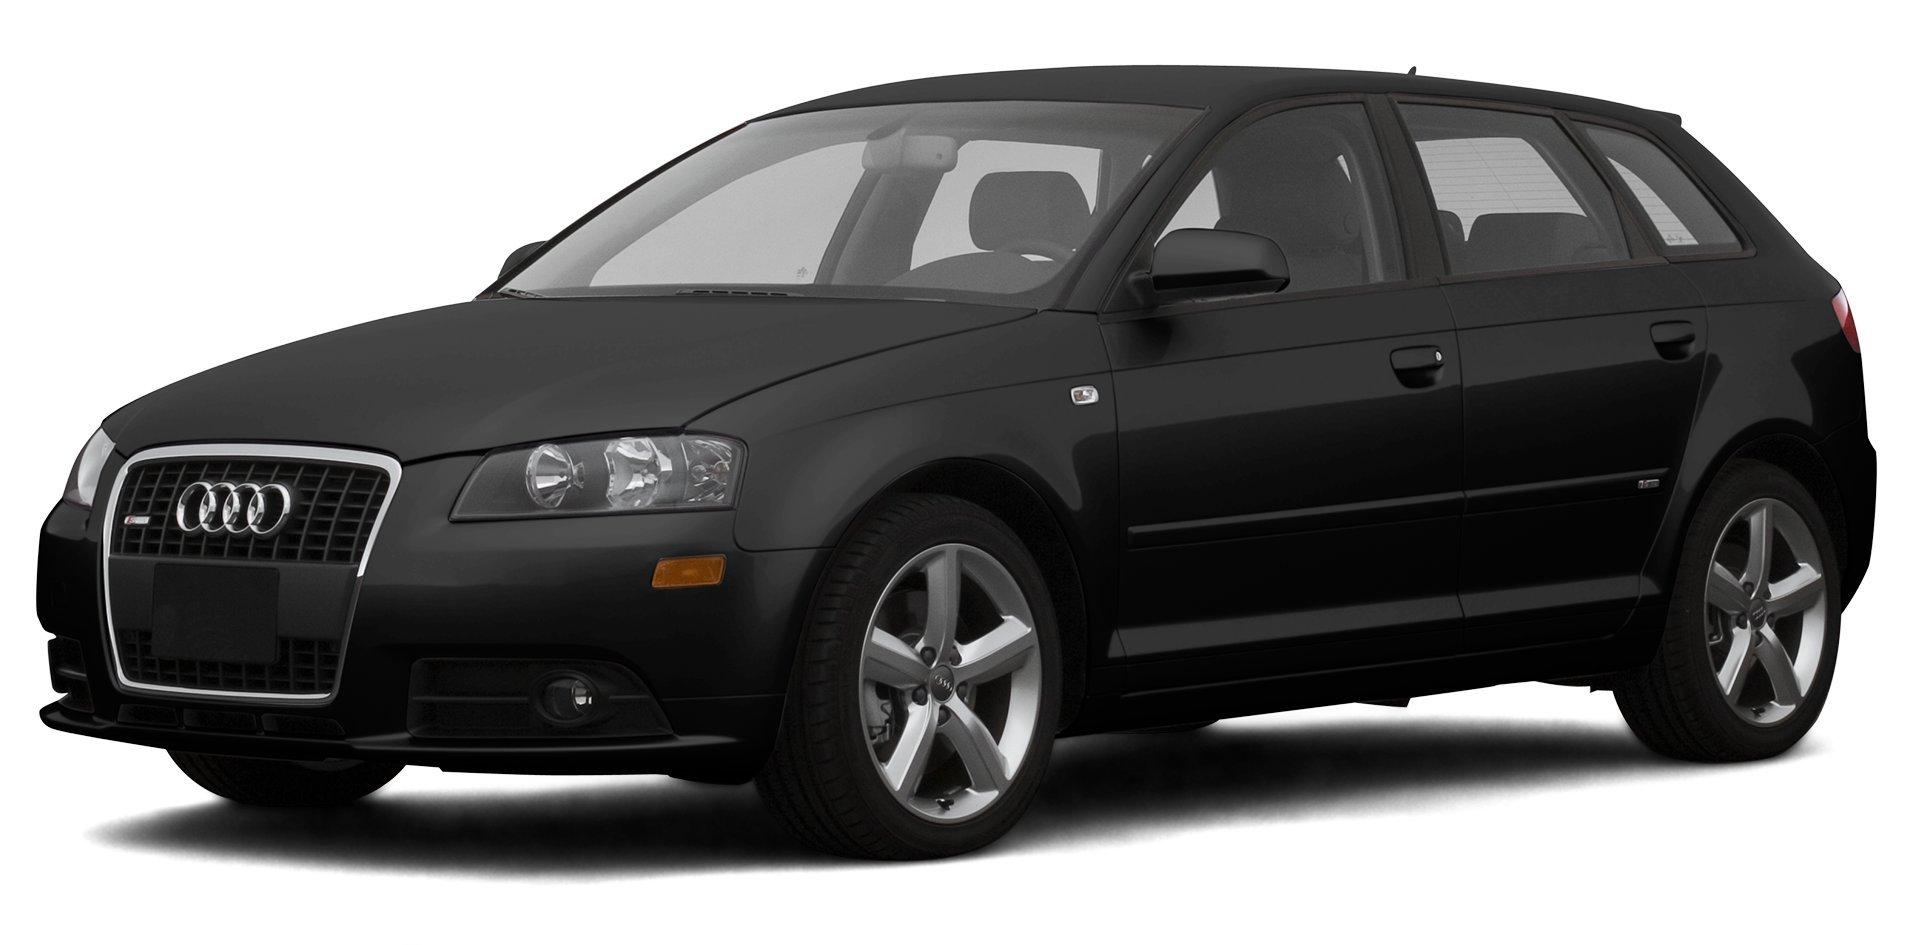 ... 2007 Audi A3 Quattro S-Line, 4-Door Hatchback Automatic Transmission  DSG quattro